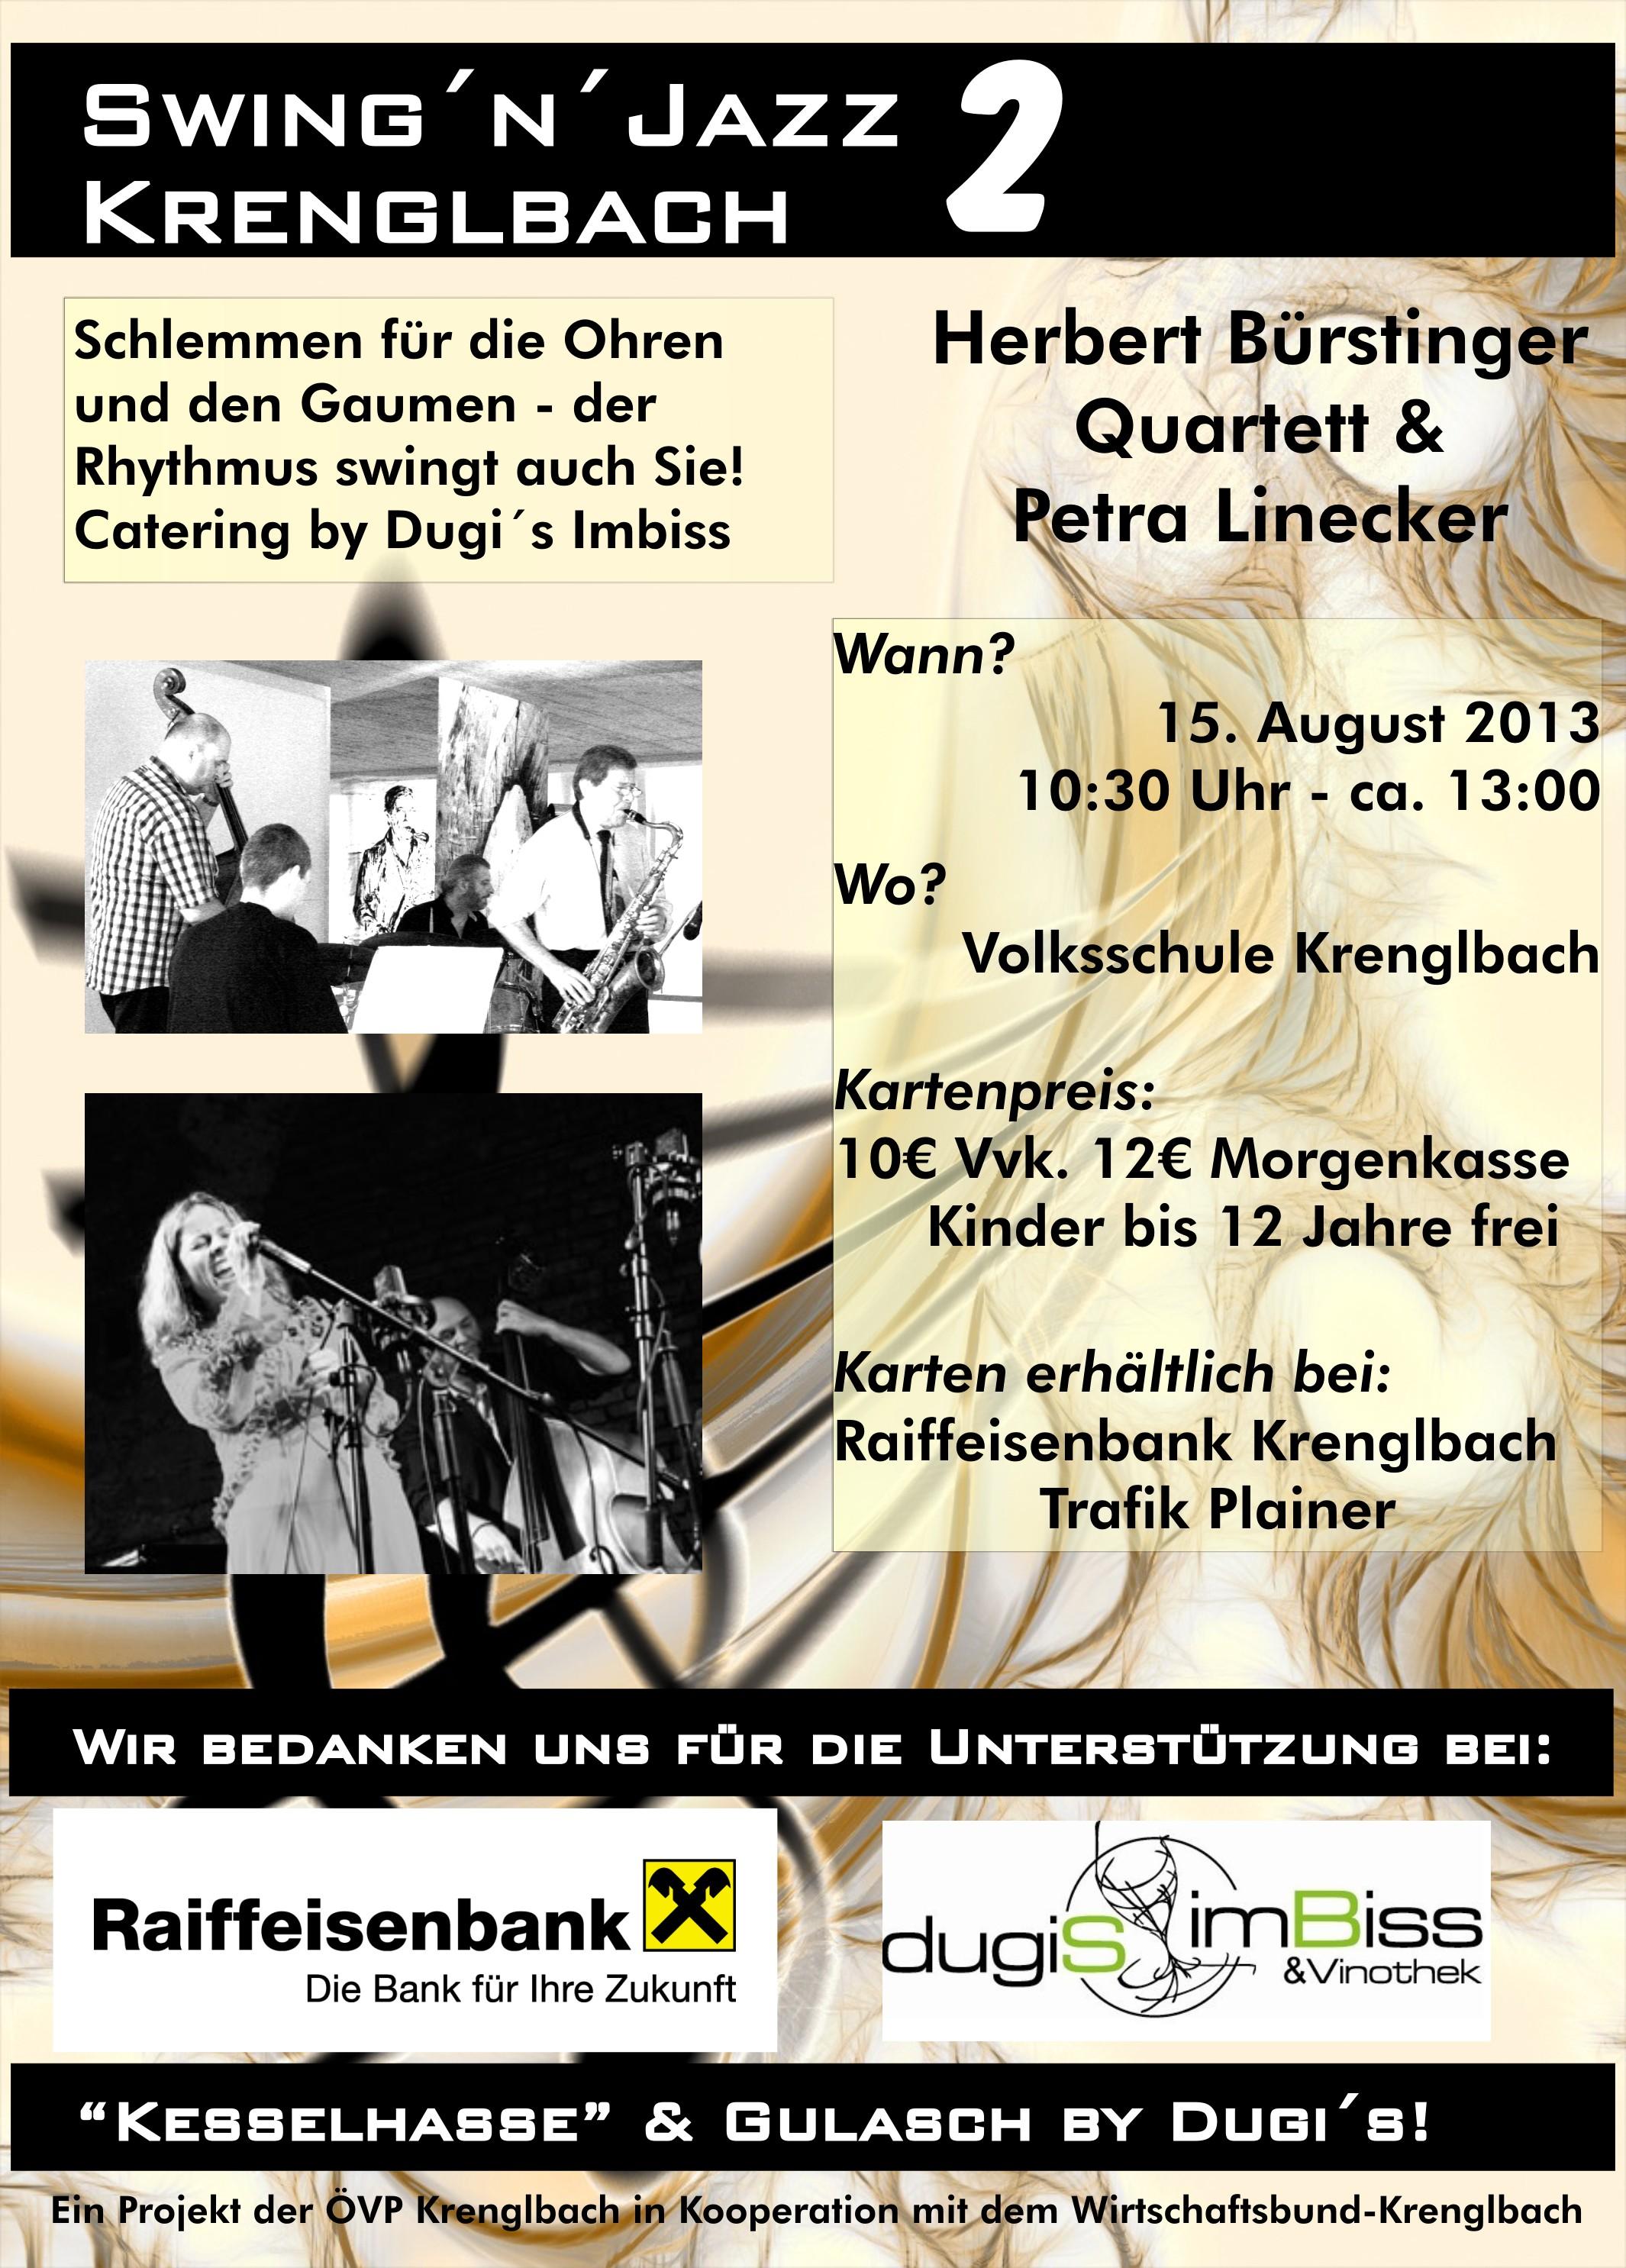 Swing & Jazz Krenglbach 2